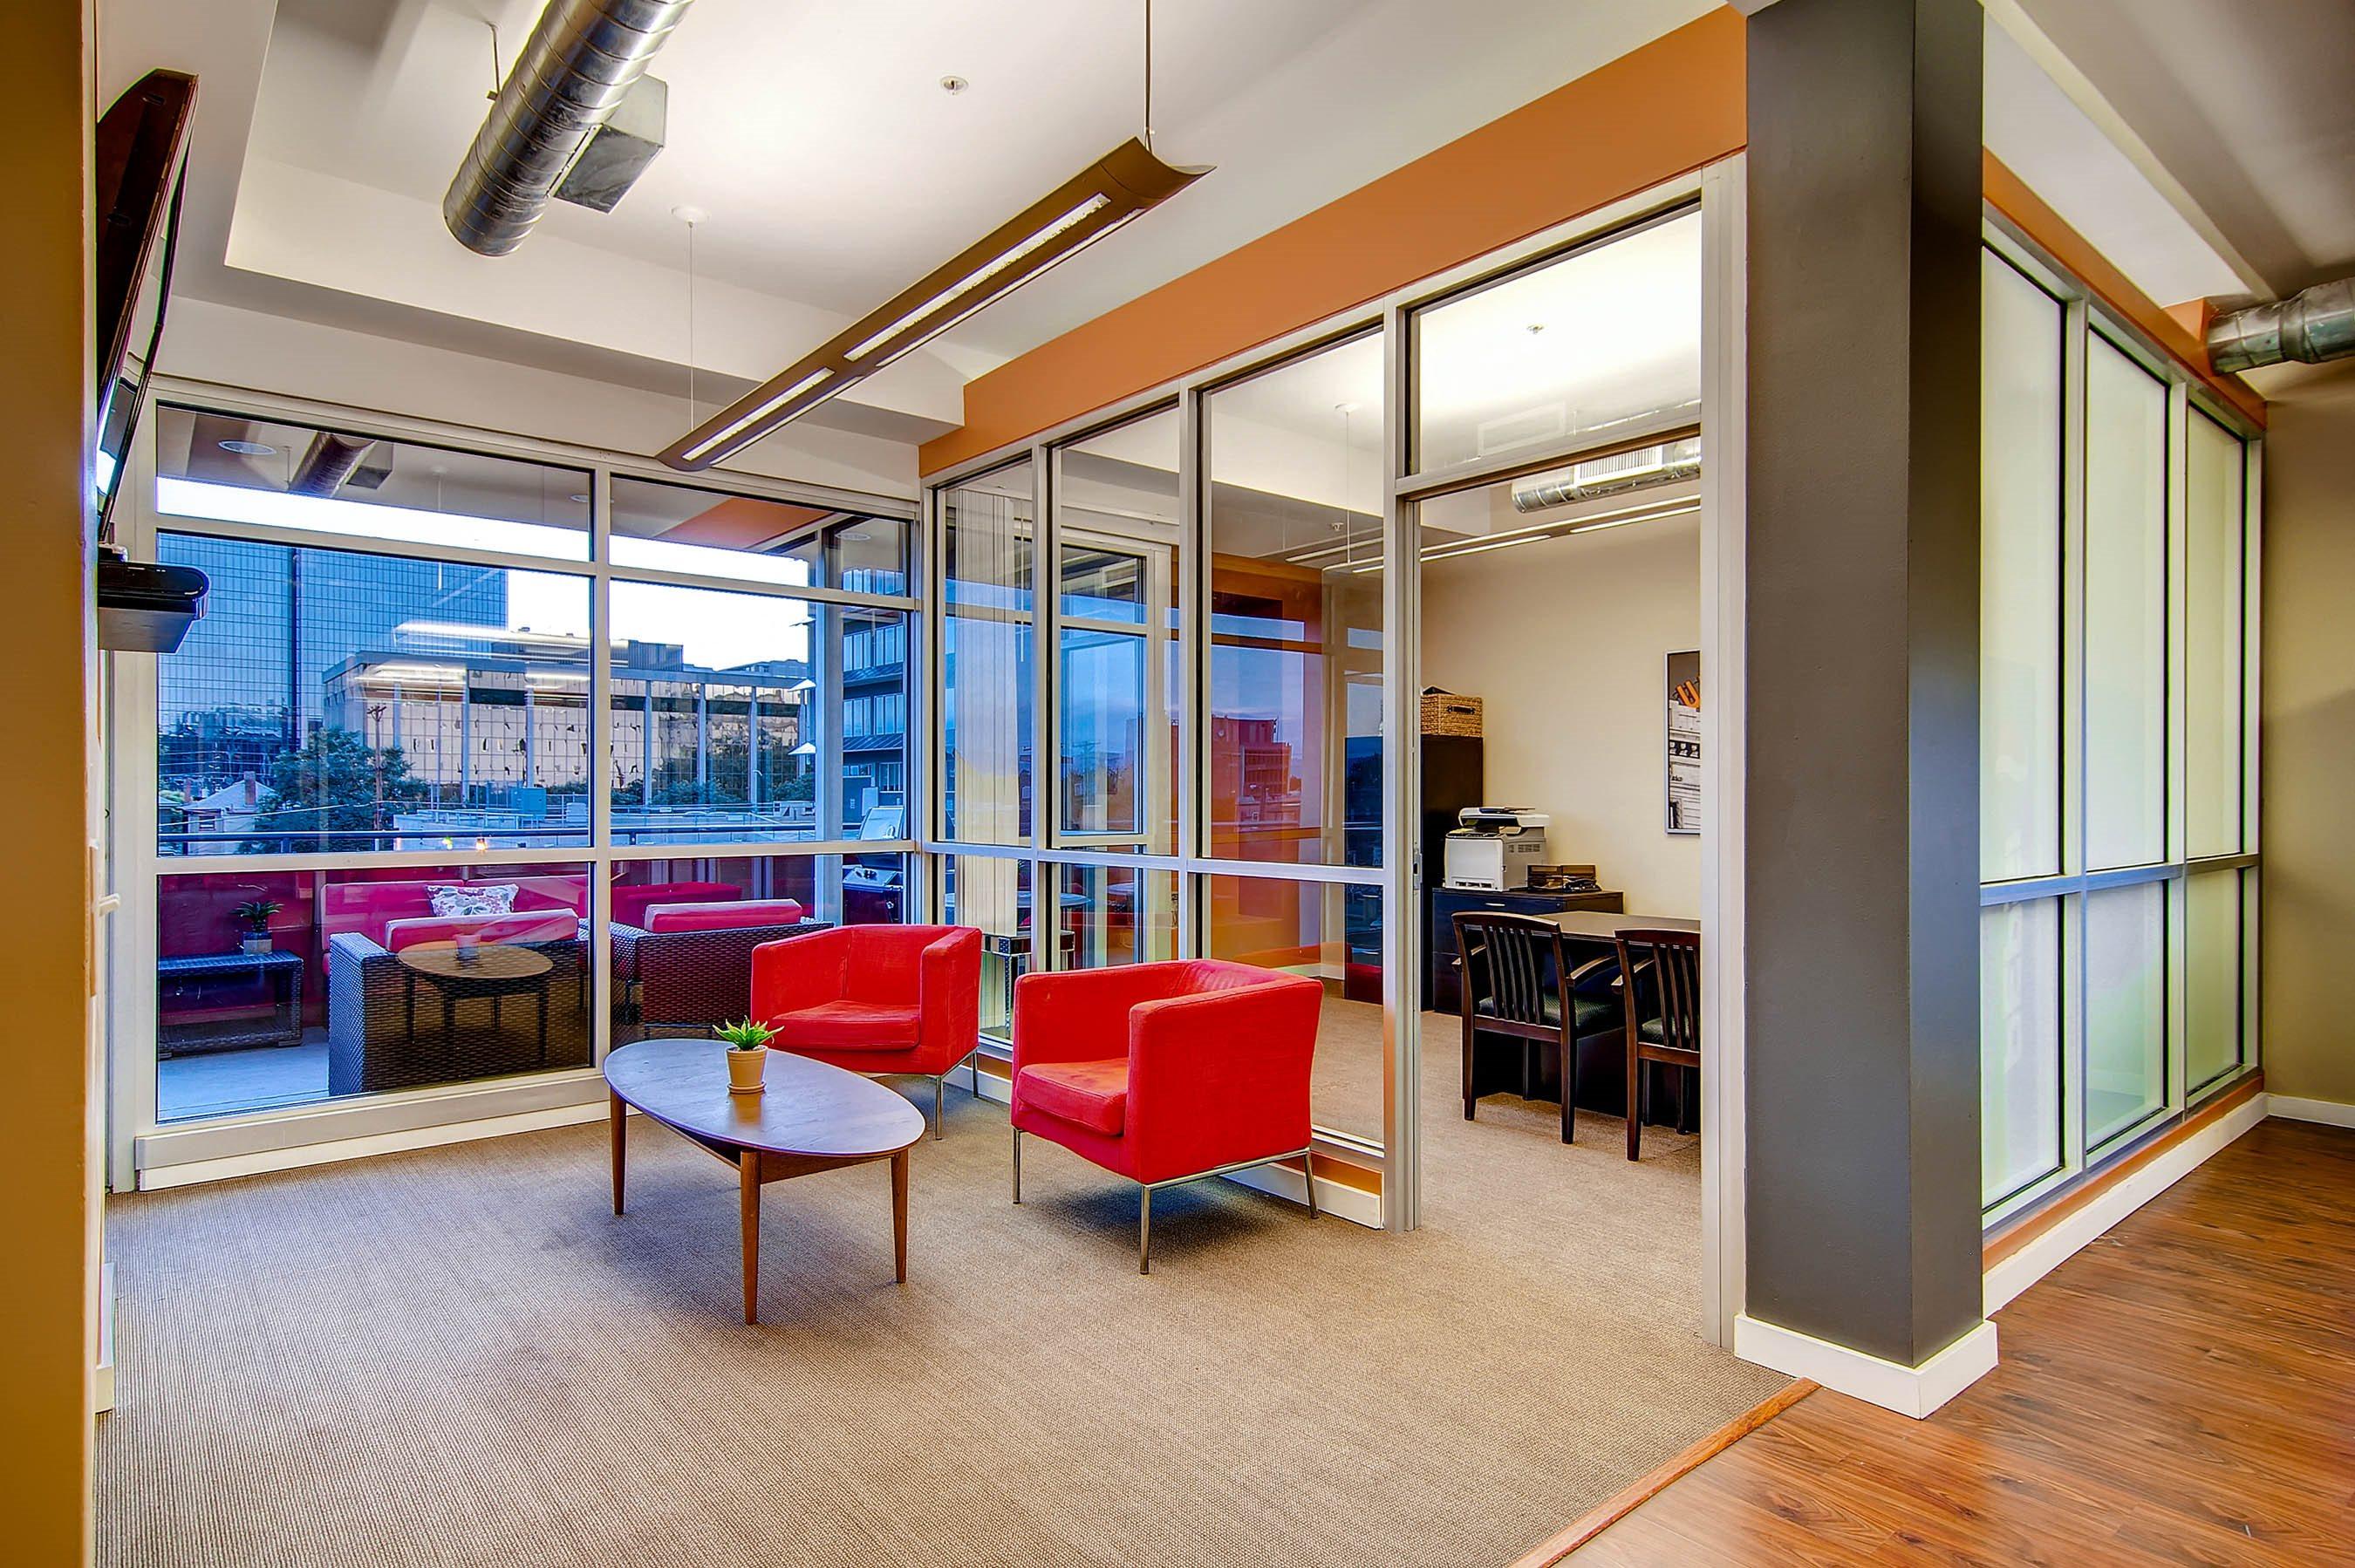 Apartments for Rent in Denver Photos - Sleek Lofts Apartments